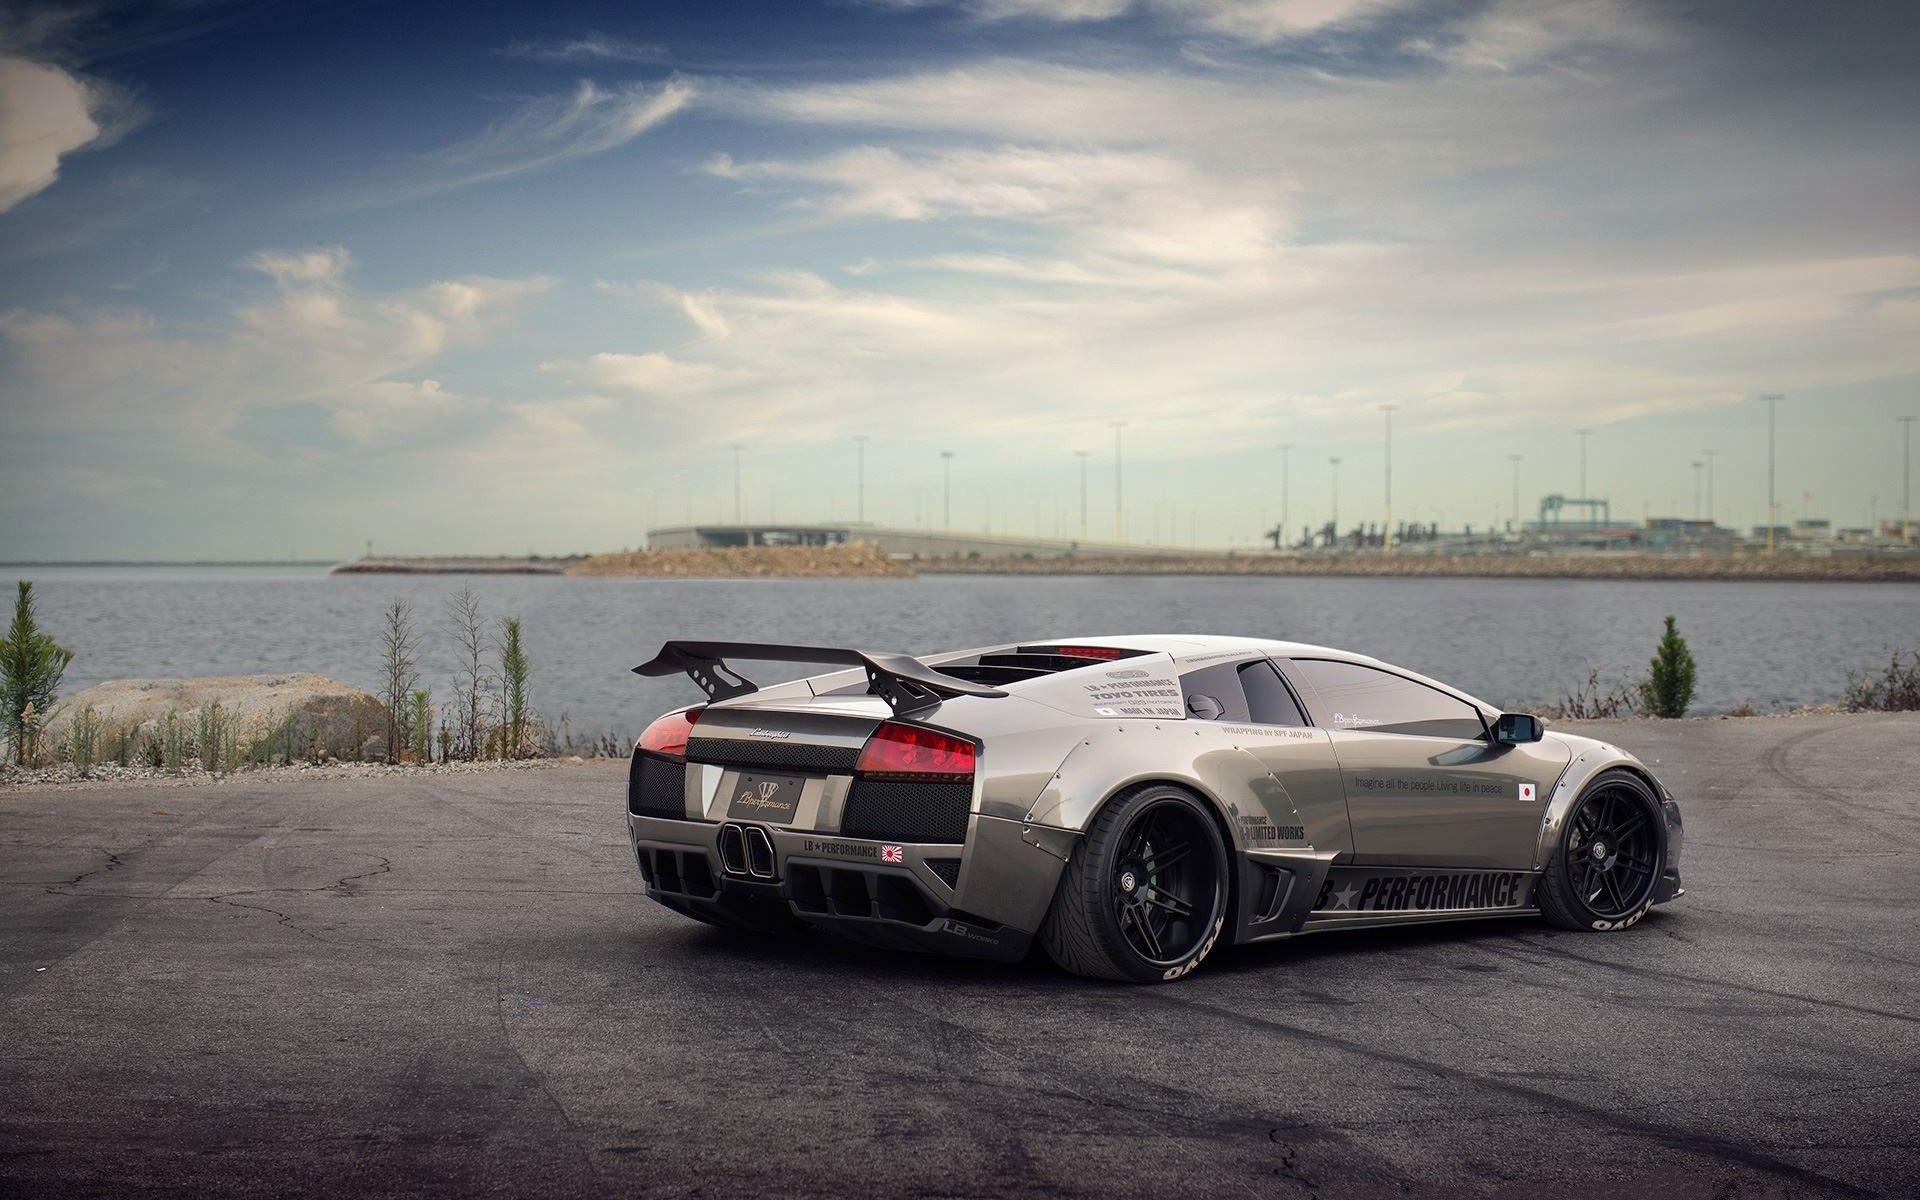 Cool Lamborghini Murcielago Lp670 4 Sv Widescreen Wallpaper Cars